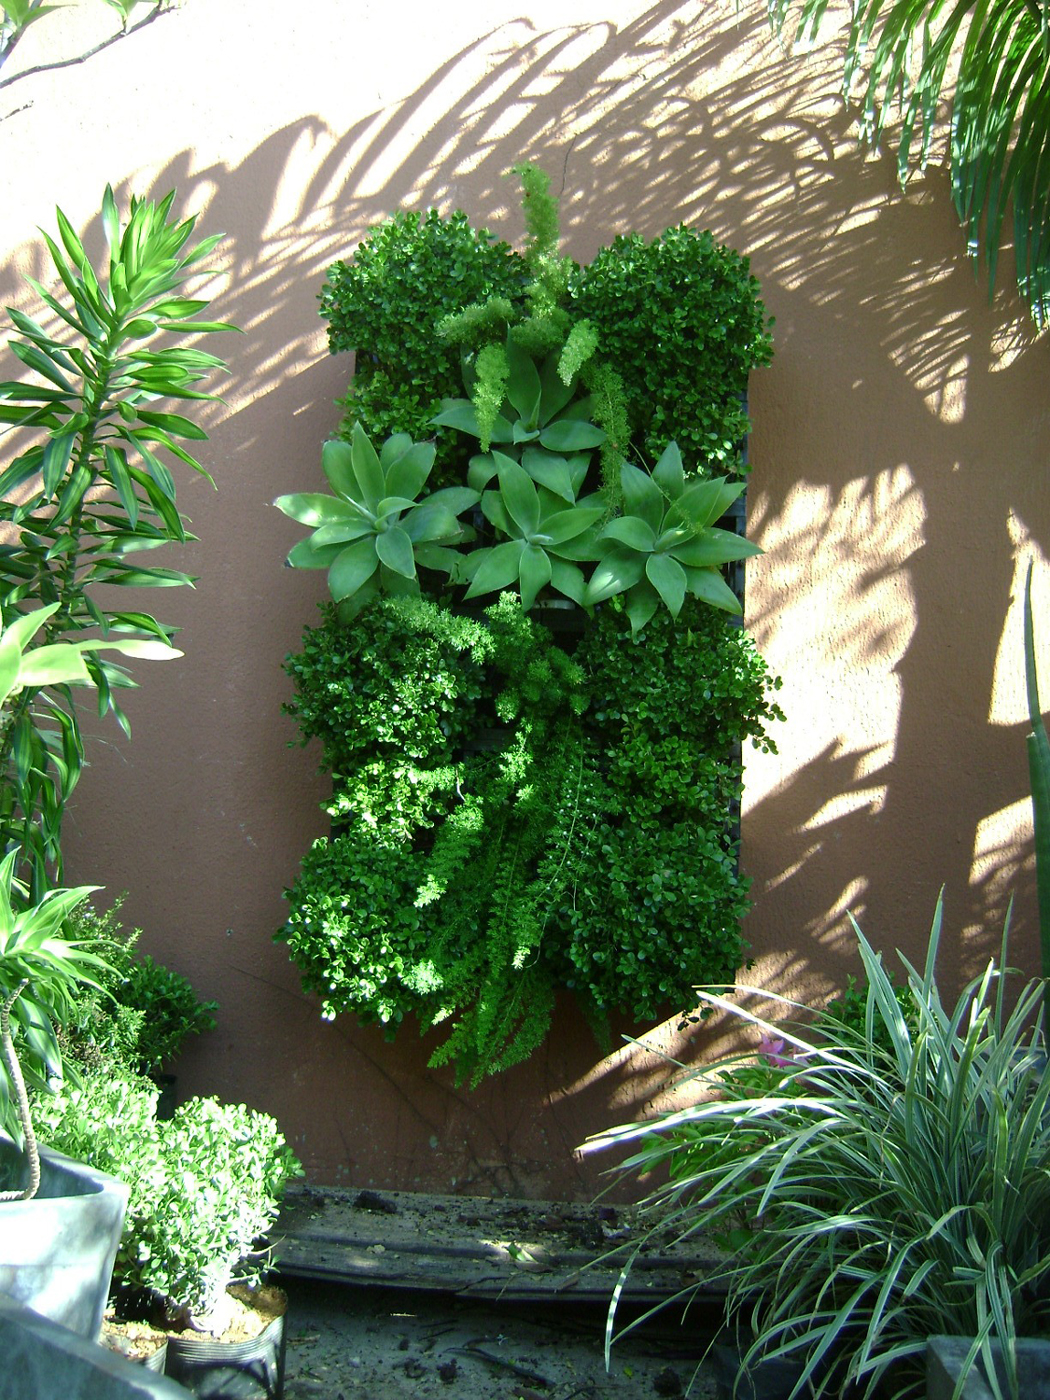 kit jardim vertical wallgreen:sábado, 16 de julho de 2011